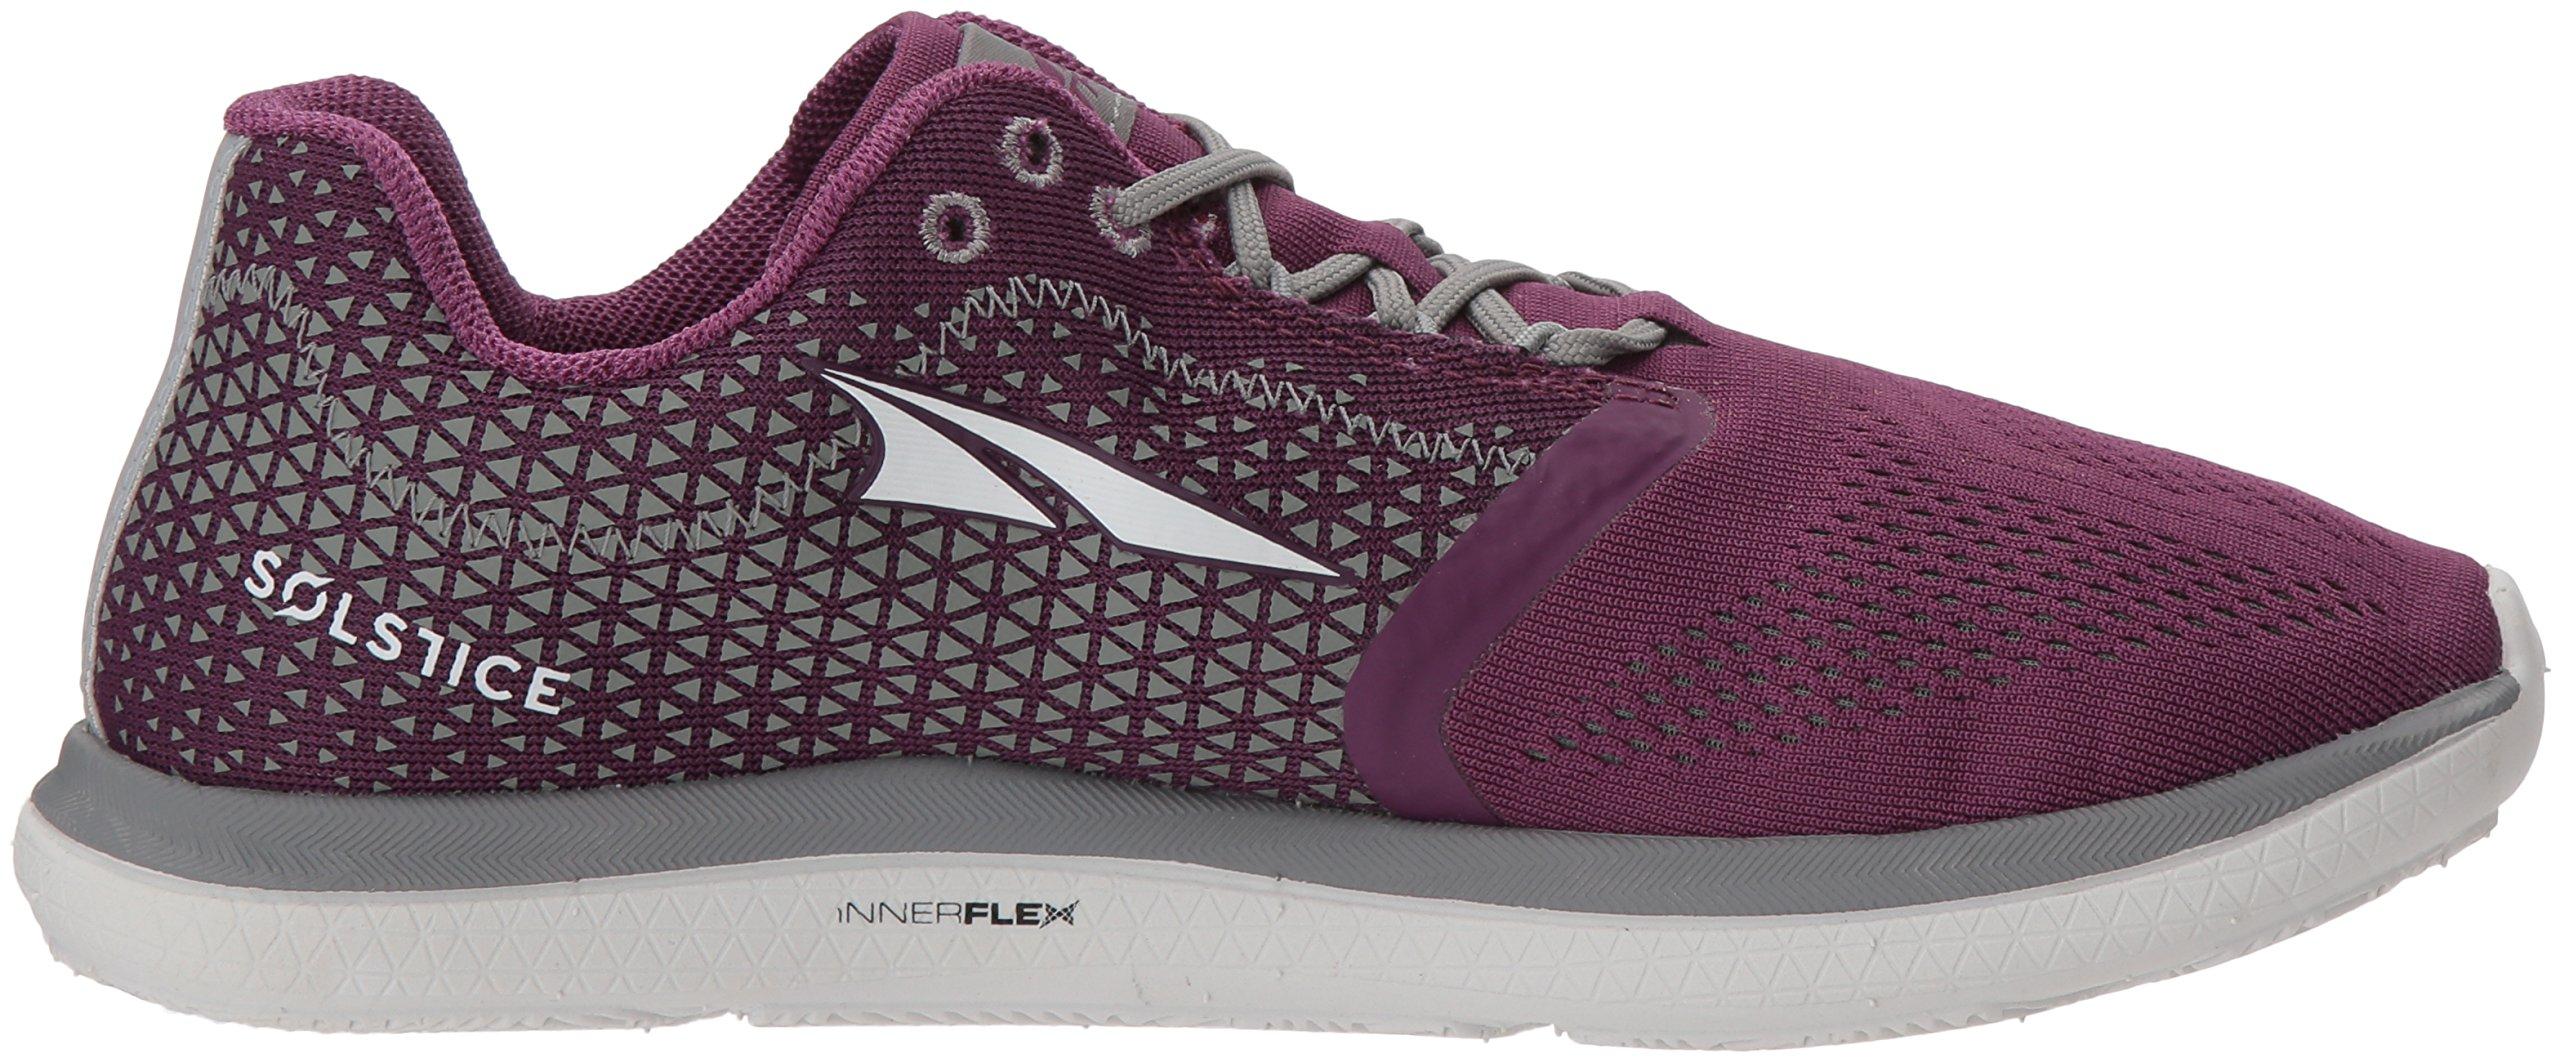 Altra Women's Solstice Sneaker, Purple, 5.5 Regular US by Altra (Image #6)